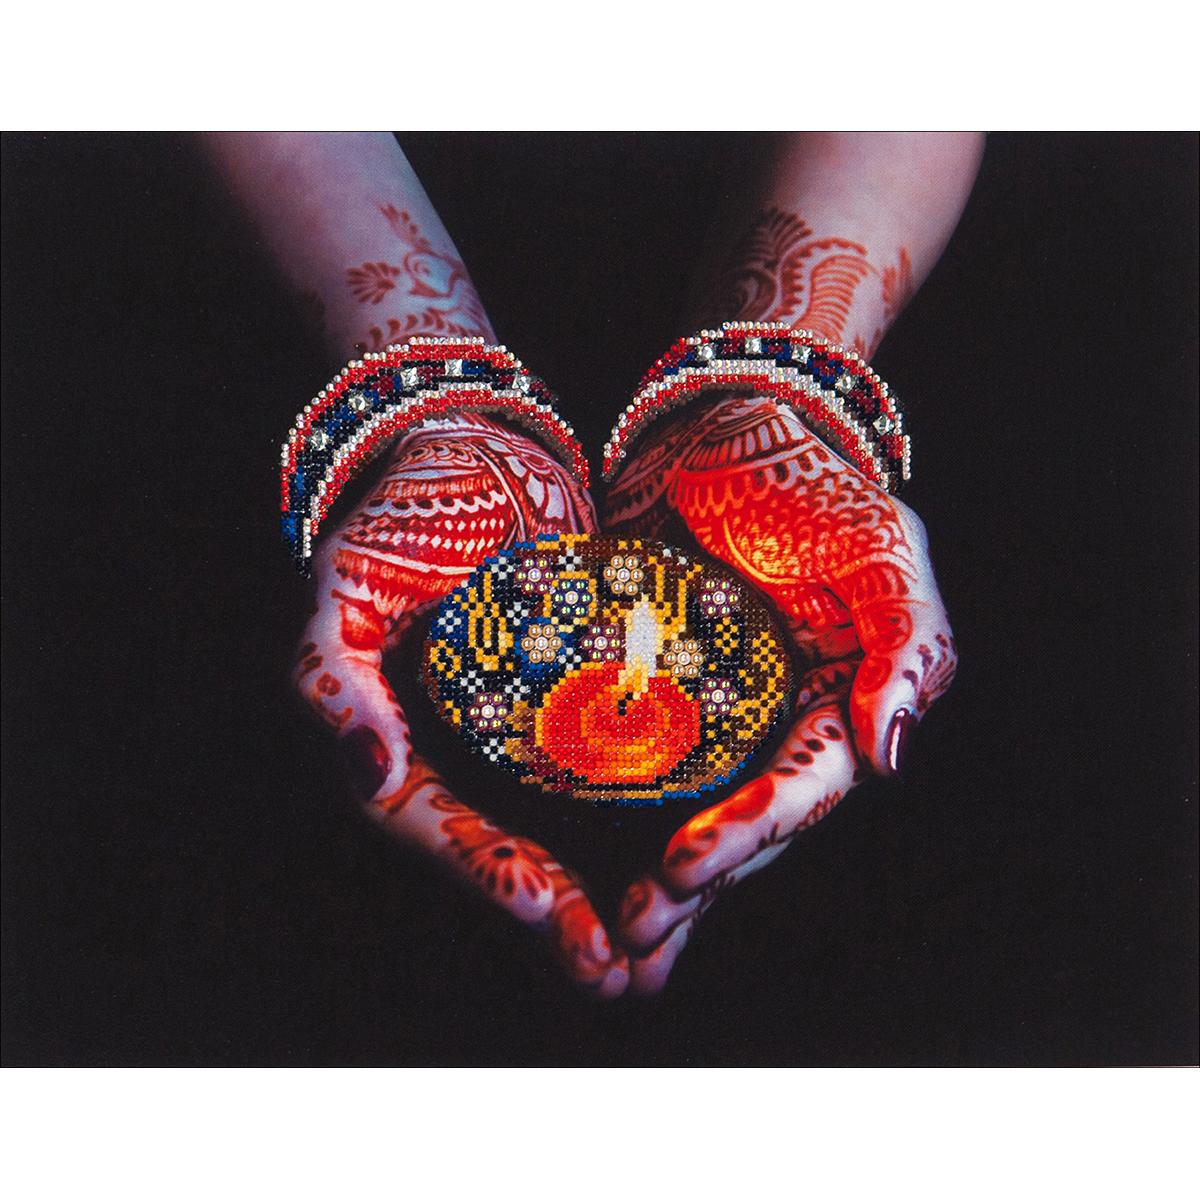 Diamond Dotz Diamond Embroidery Facet Art Kit 21.75X17.25-Peaceful Offering